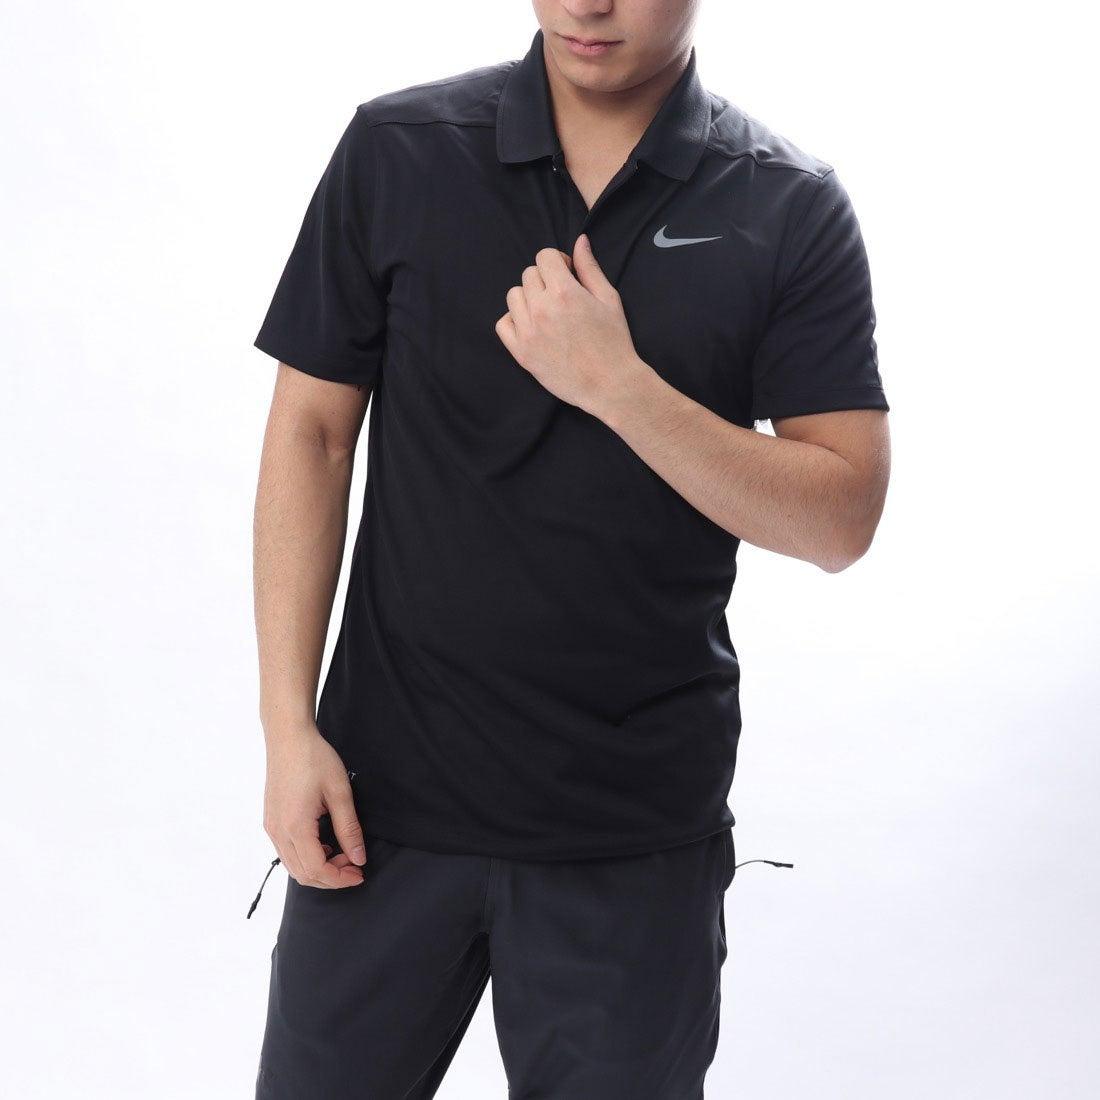 09112c3855969 ナイキゴルフ NIKE GOLF メンズ ゴルフ 半袖 シャツ DRI-FIT ビクトリー ソリッド スリム ポロ 891856010  -レディースファッション通販 ロコンドガールズコレクション ...